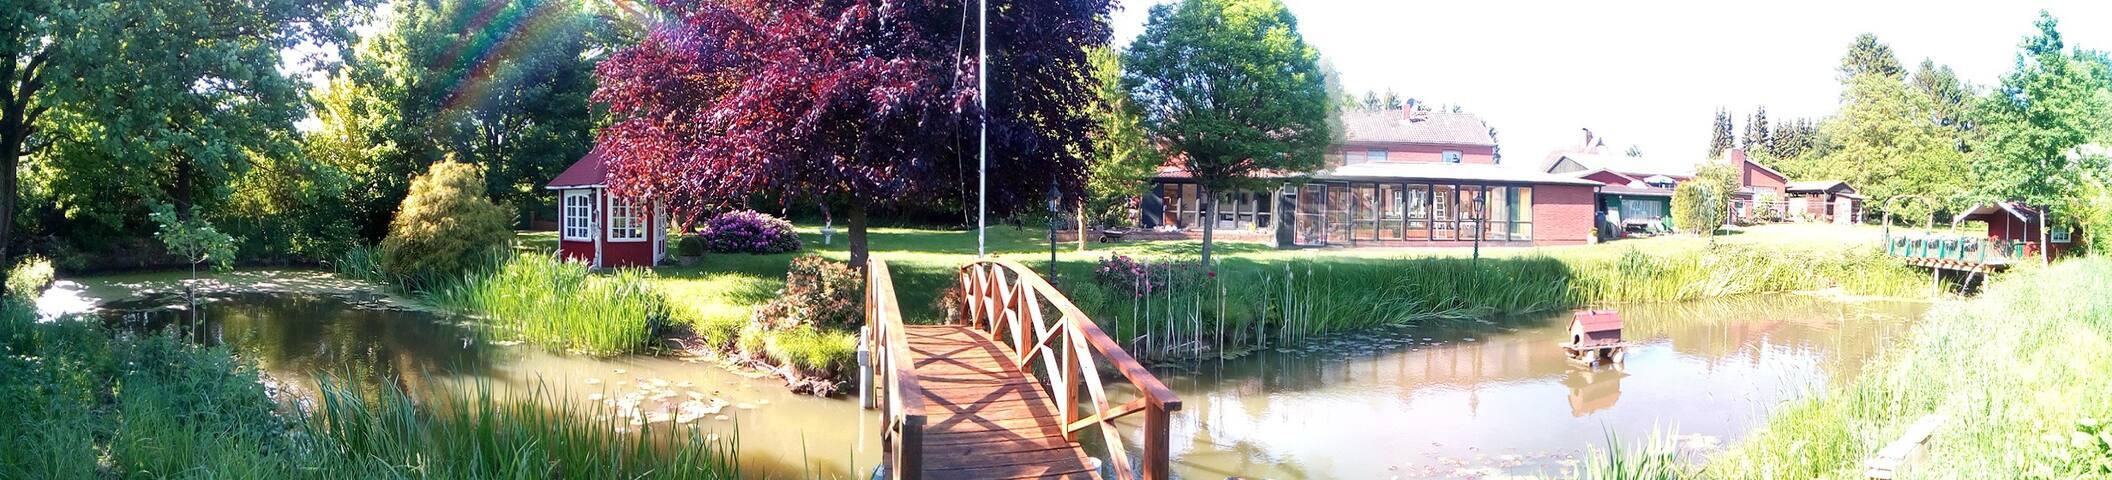 Traumoase Ganzes Haus m. Pool & Sauna nahe Ostsee